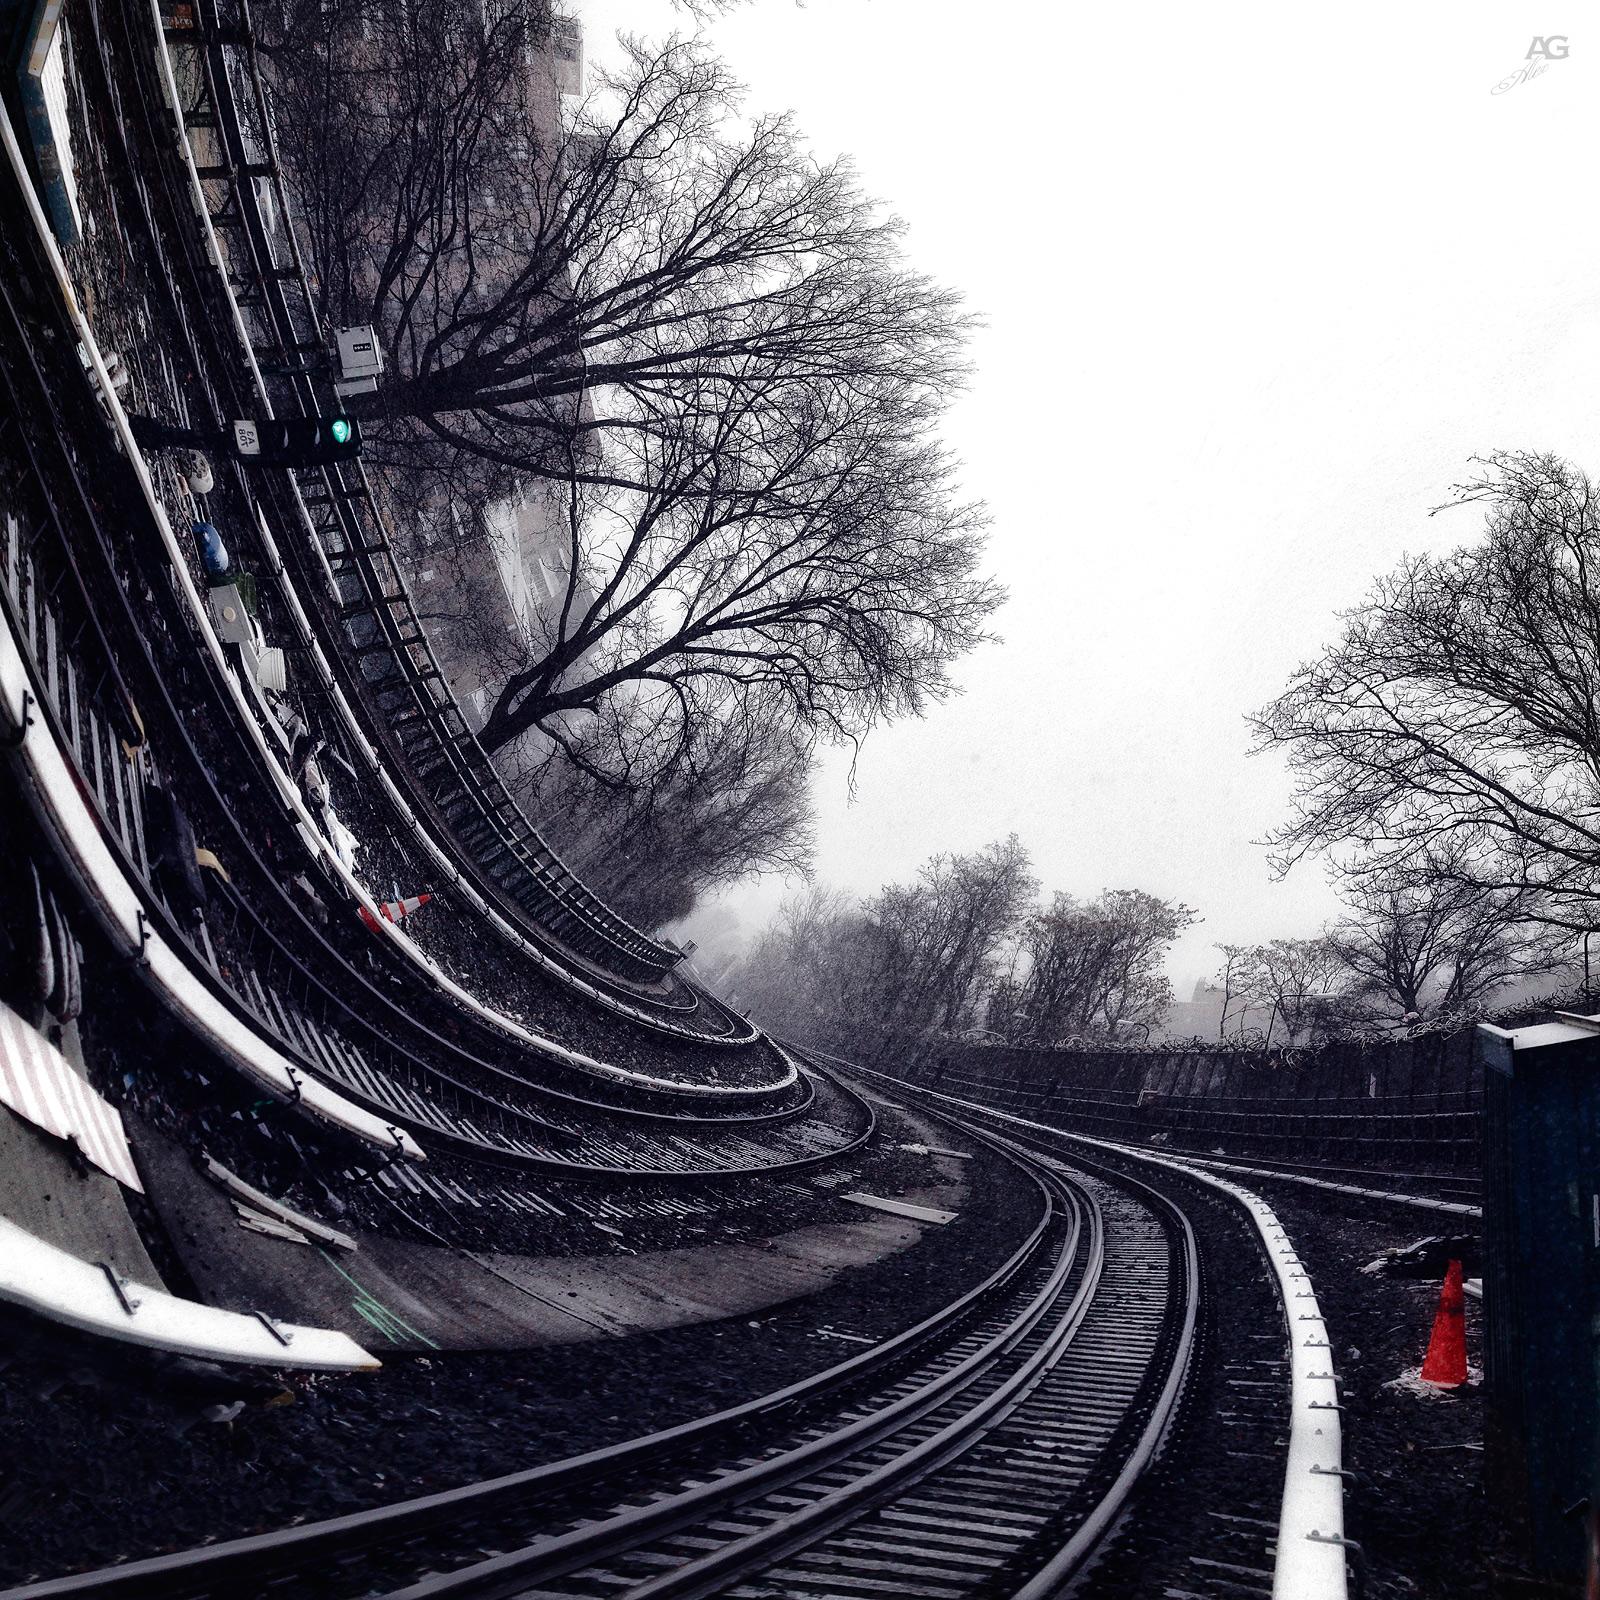 TrainTracksFromSheepsheadBayStationSnowyDay_curved_1600